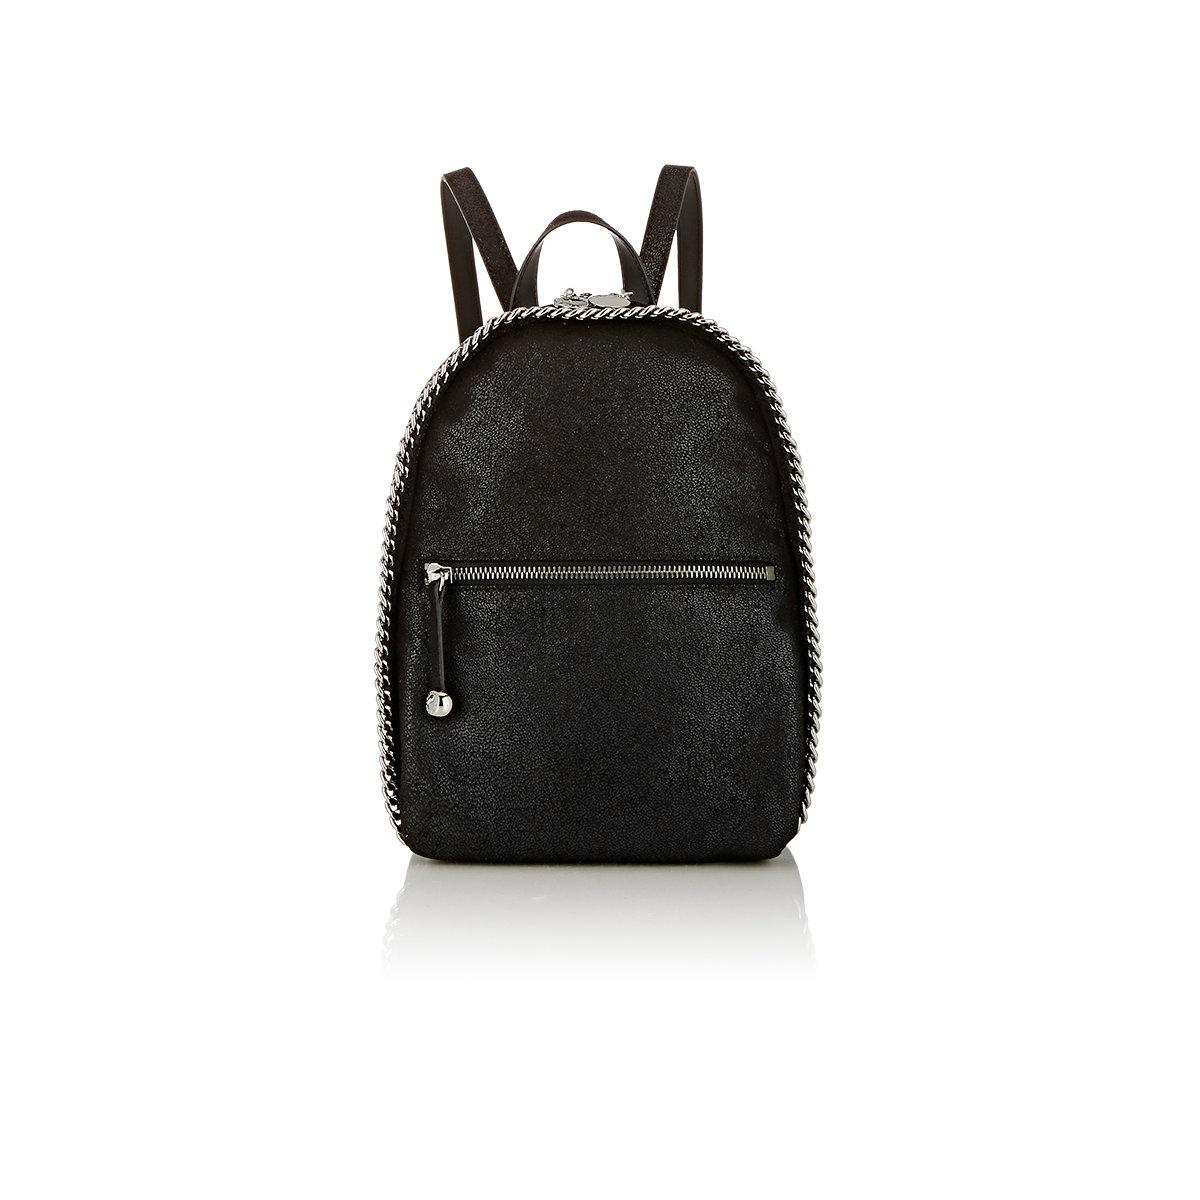 stella mccartney women 39 s falabella shaggy deer mini rucksack in black lyst. Black Bedroom Furniture Sets. Home Design Ideas